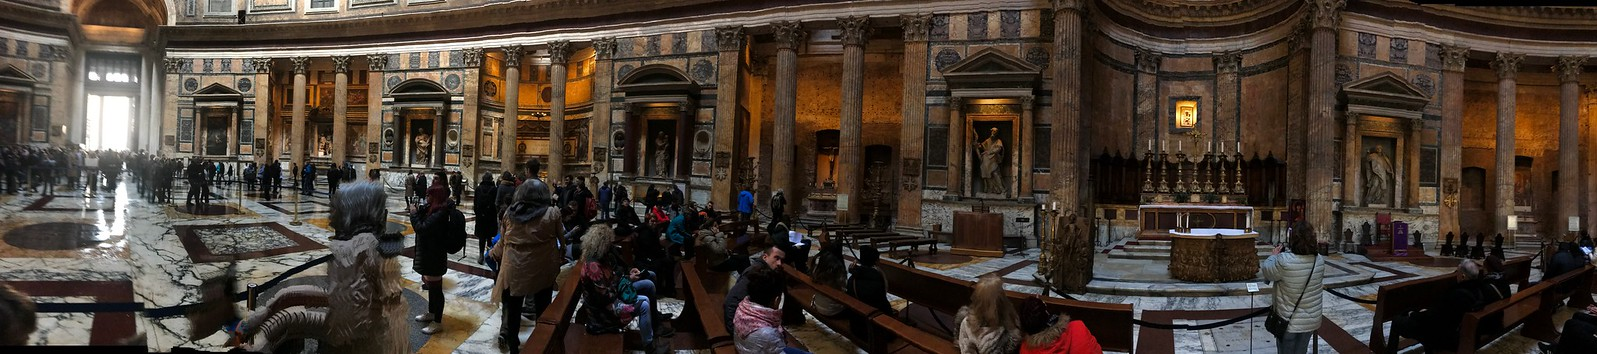 Panoramic Photo of floor of Pantheon